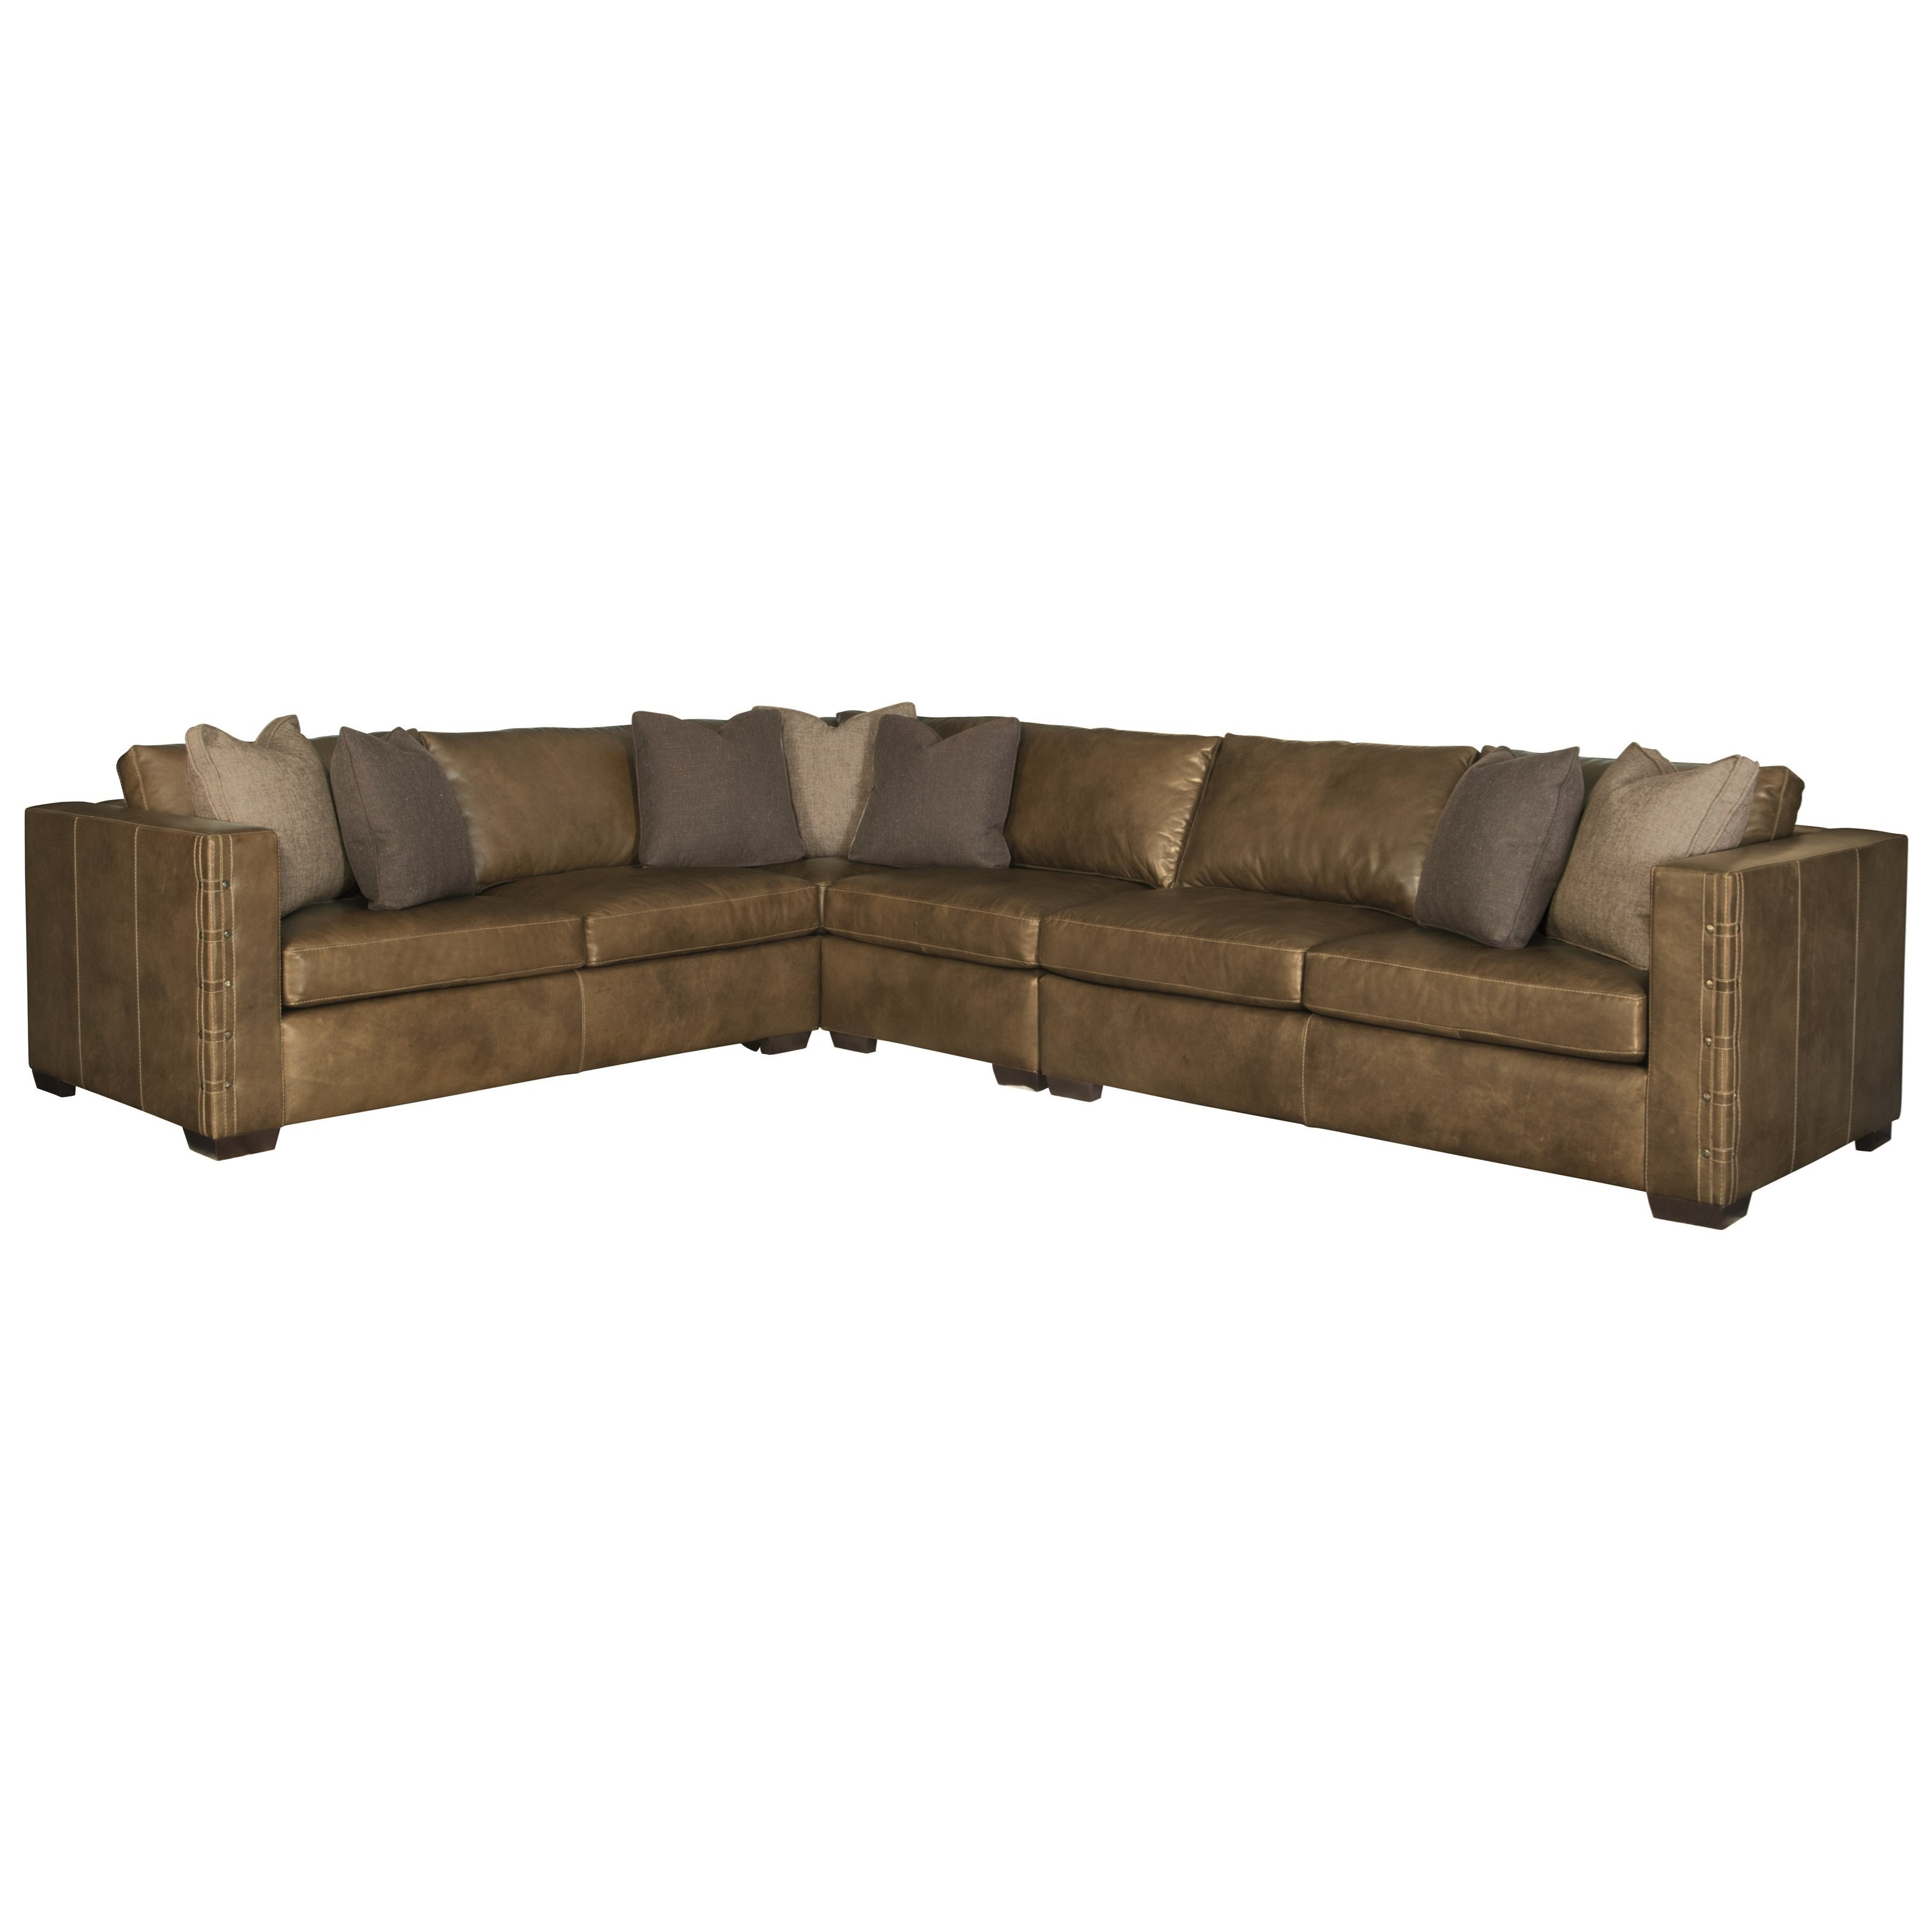 Bernhardt galloway sectional sofa reeds furniture sofa for Bernhardt furniture sectional sofa